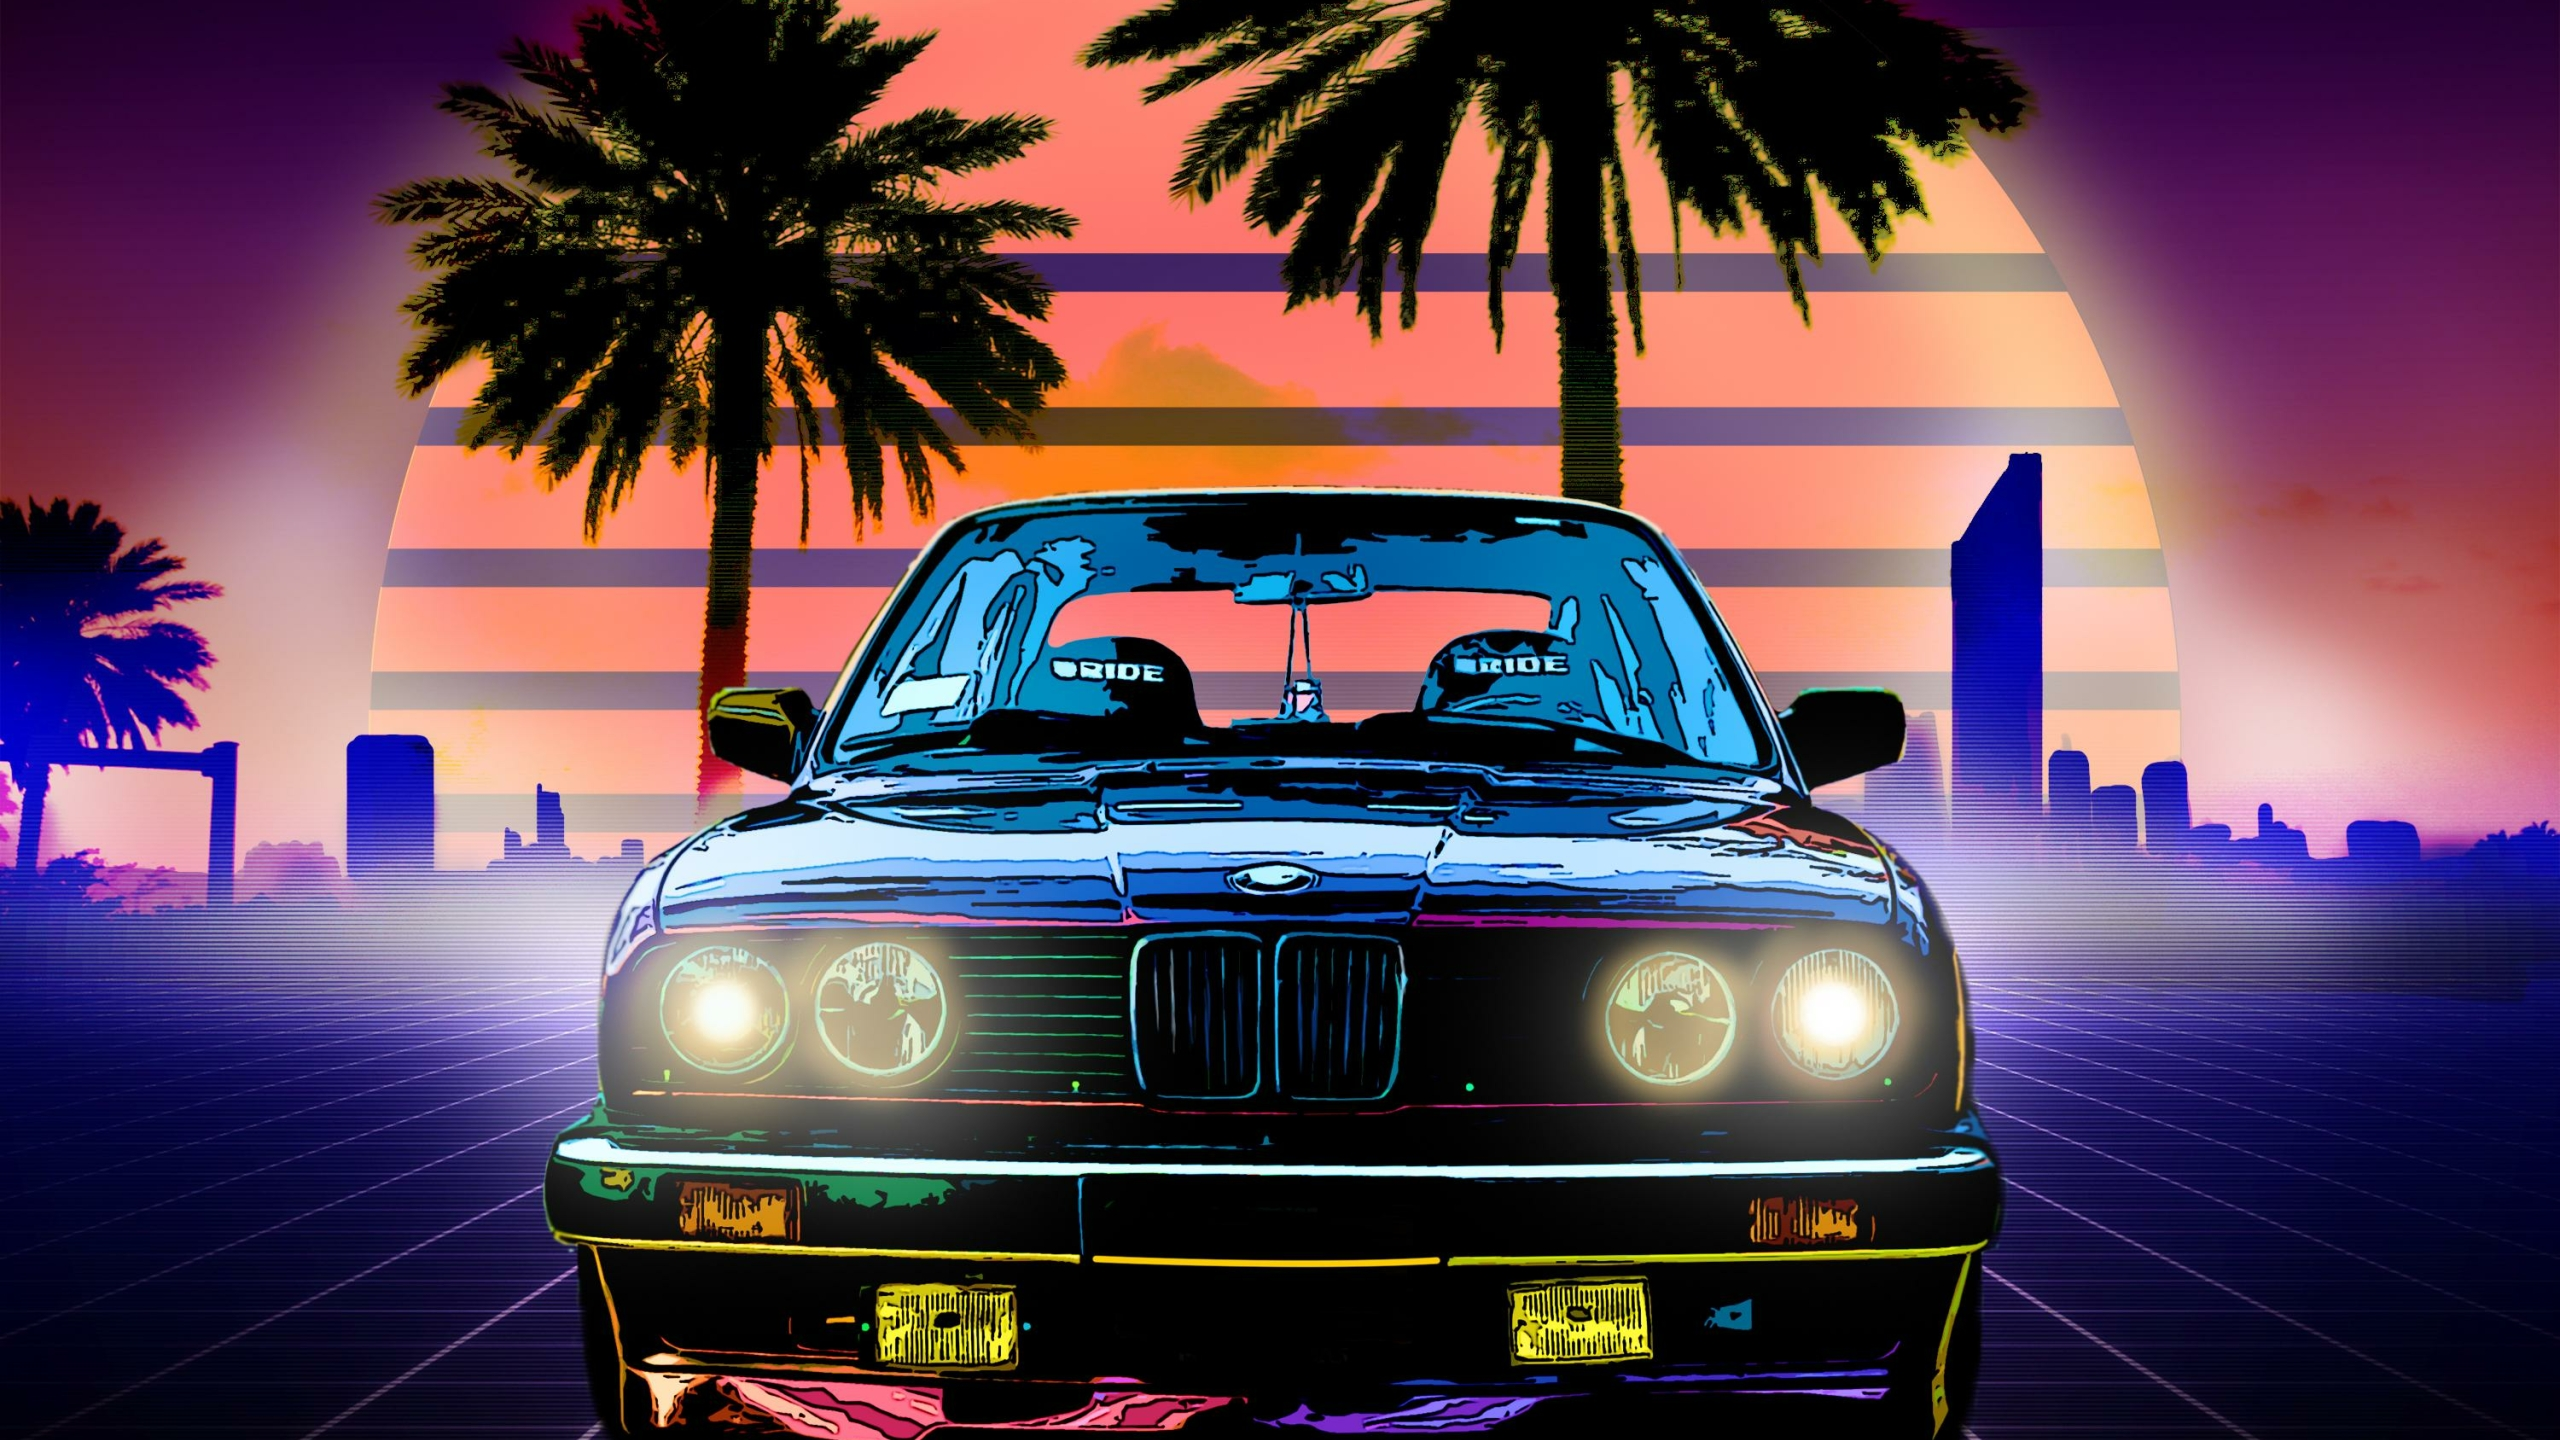 2560x1440 BMW Retro Style 1440P Resolution Wallpaper, HD ...